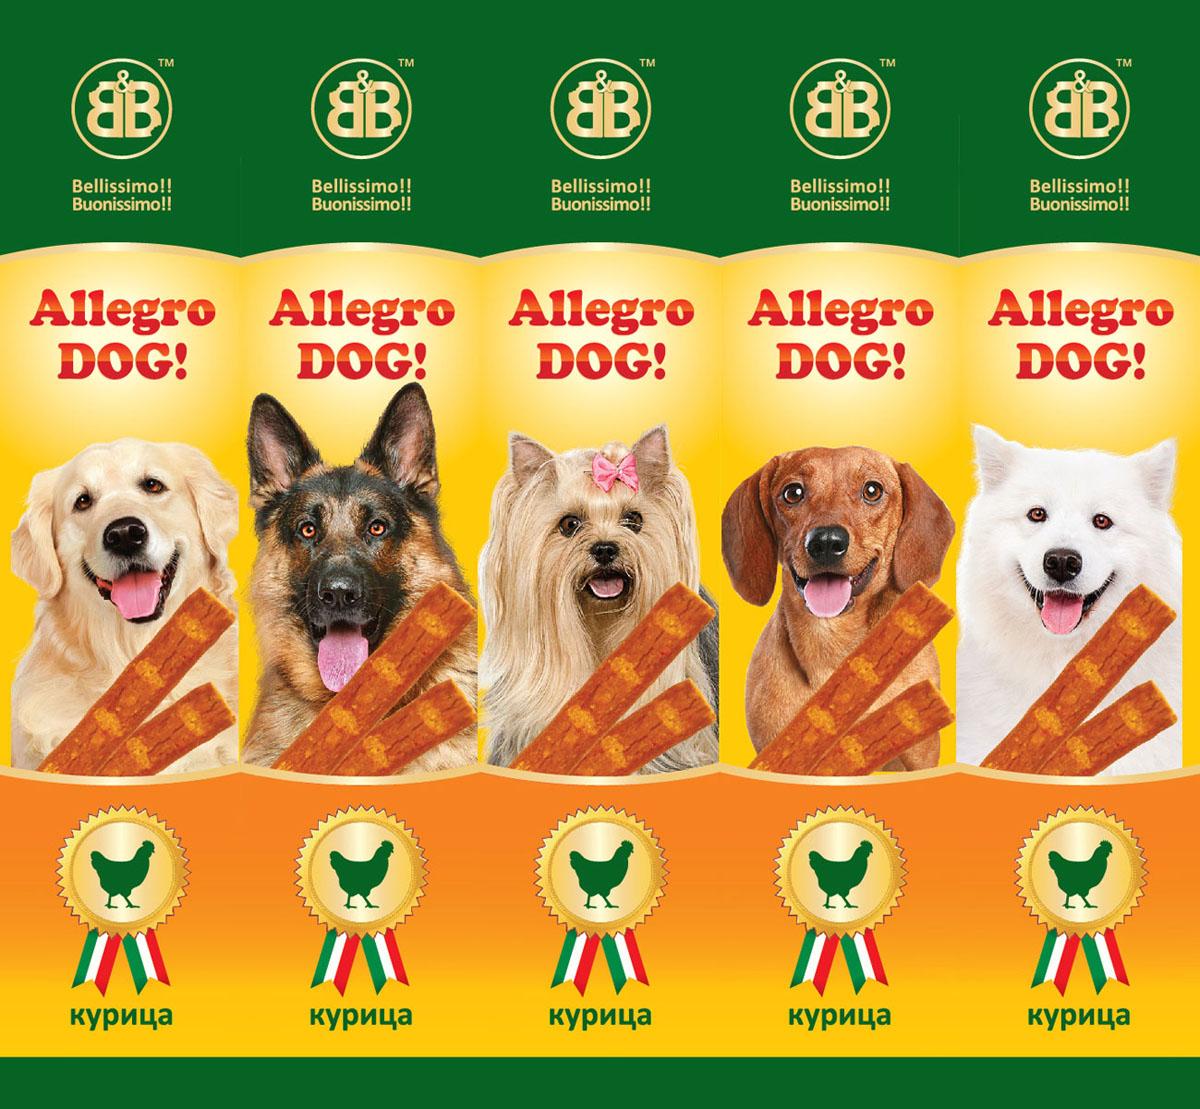 лакомство b&b allegro cat колбаски курица печень для кошек 6шт 36450 Лакомство для собак B&B Колбаски Allegro Dog, курица, 5х10 г